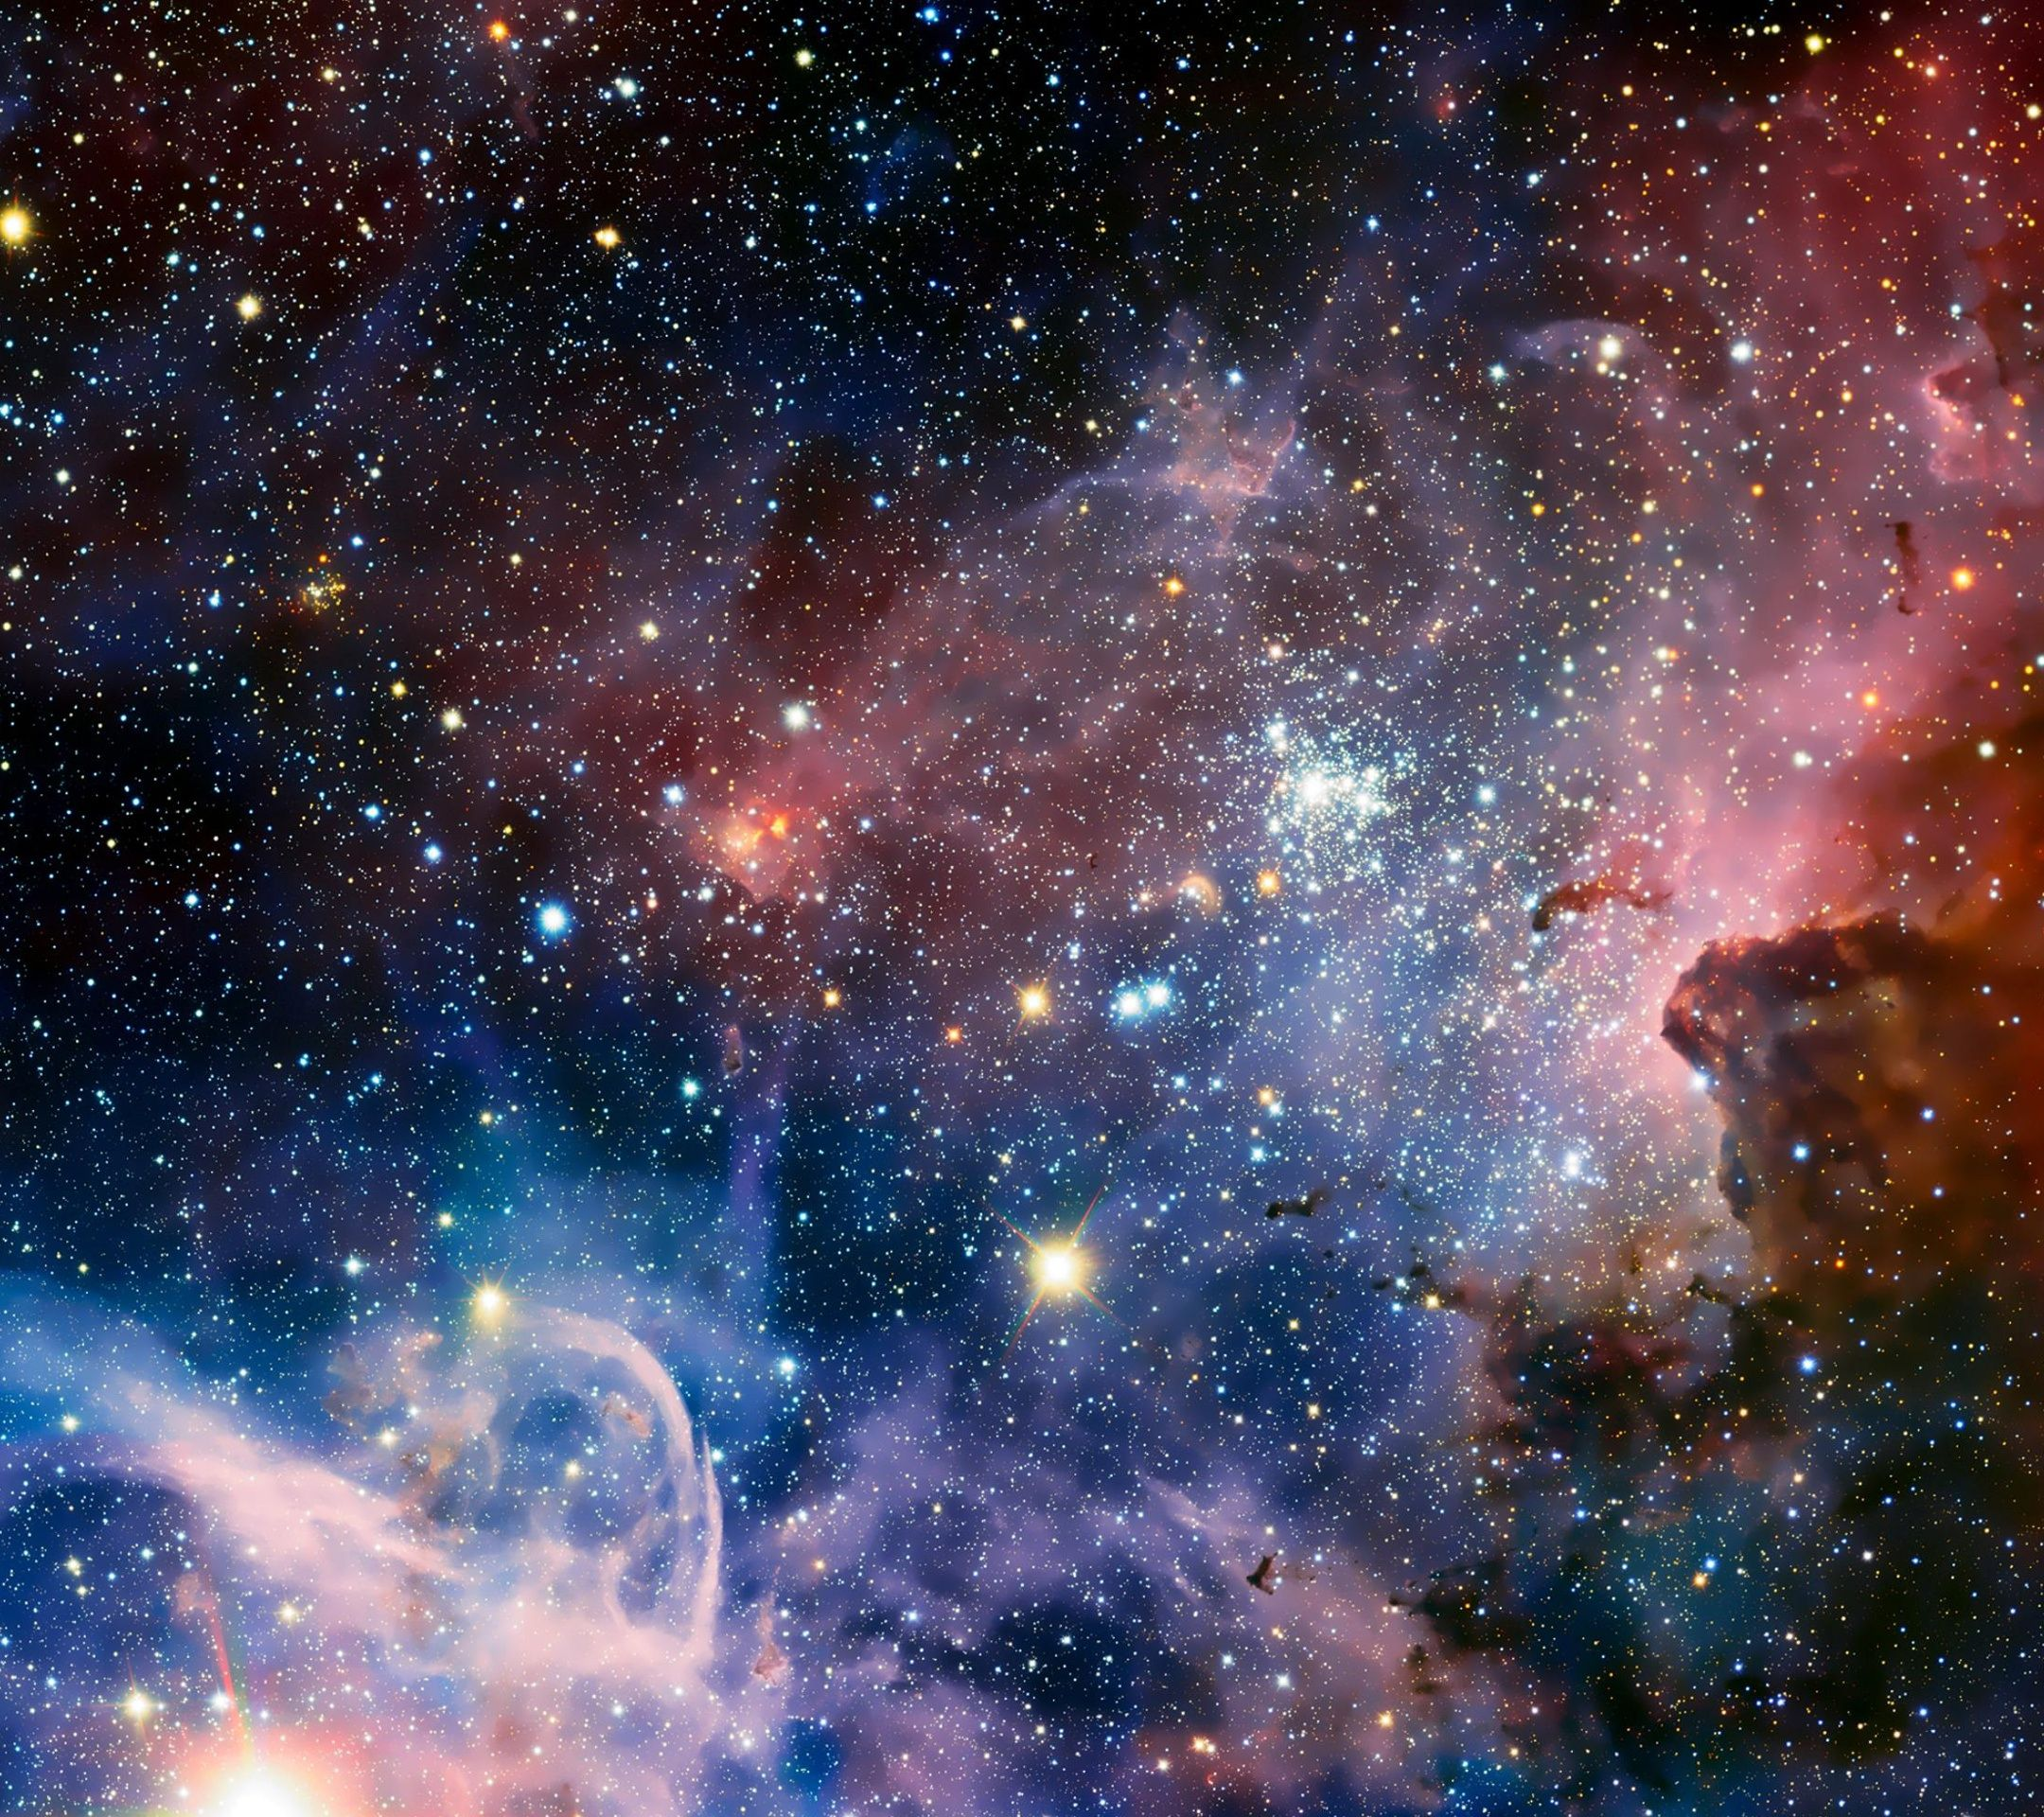 Nebula HD Wallpaper Samsung Galaxy S5 Wallpapers Free 2160x1920